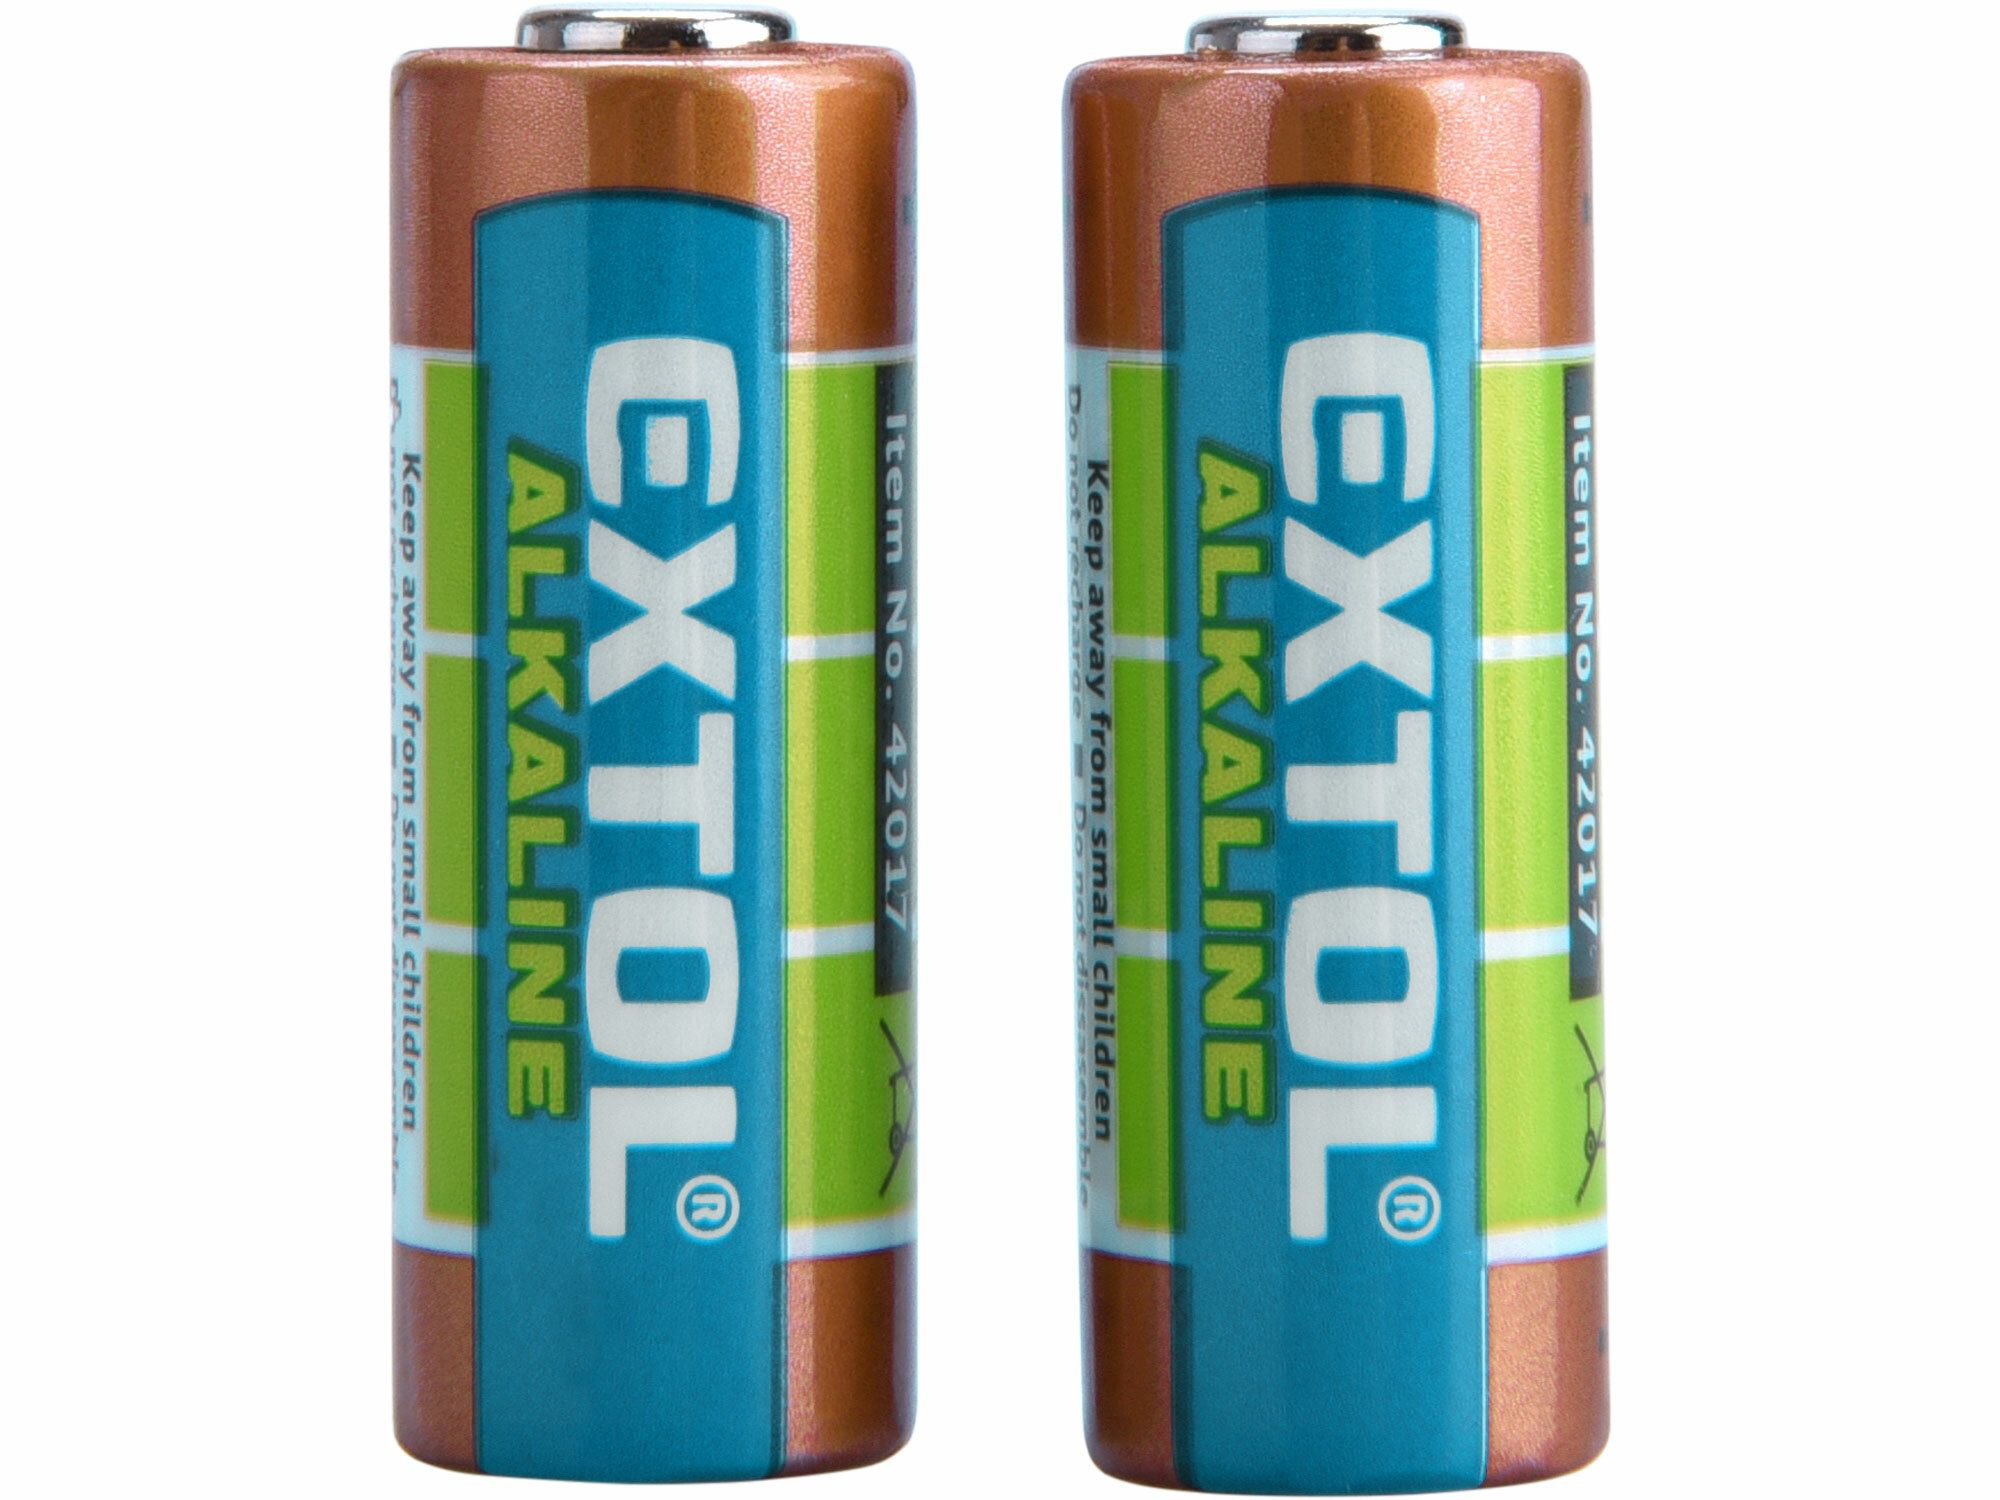 Baterie alkalické, 2ks, 12V (23A) EXTOL-ENERGY